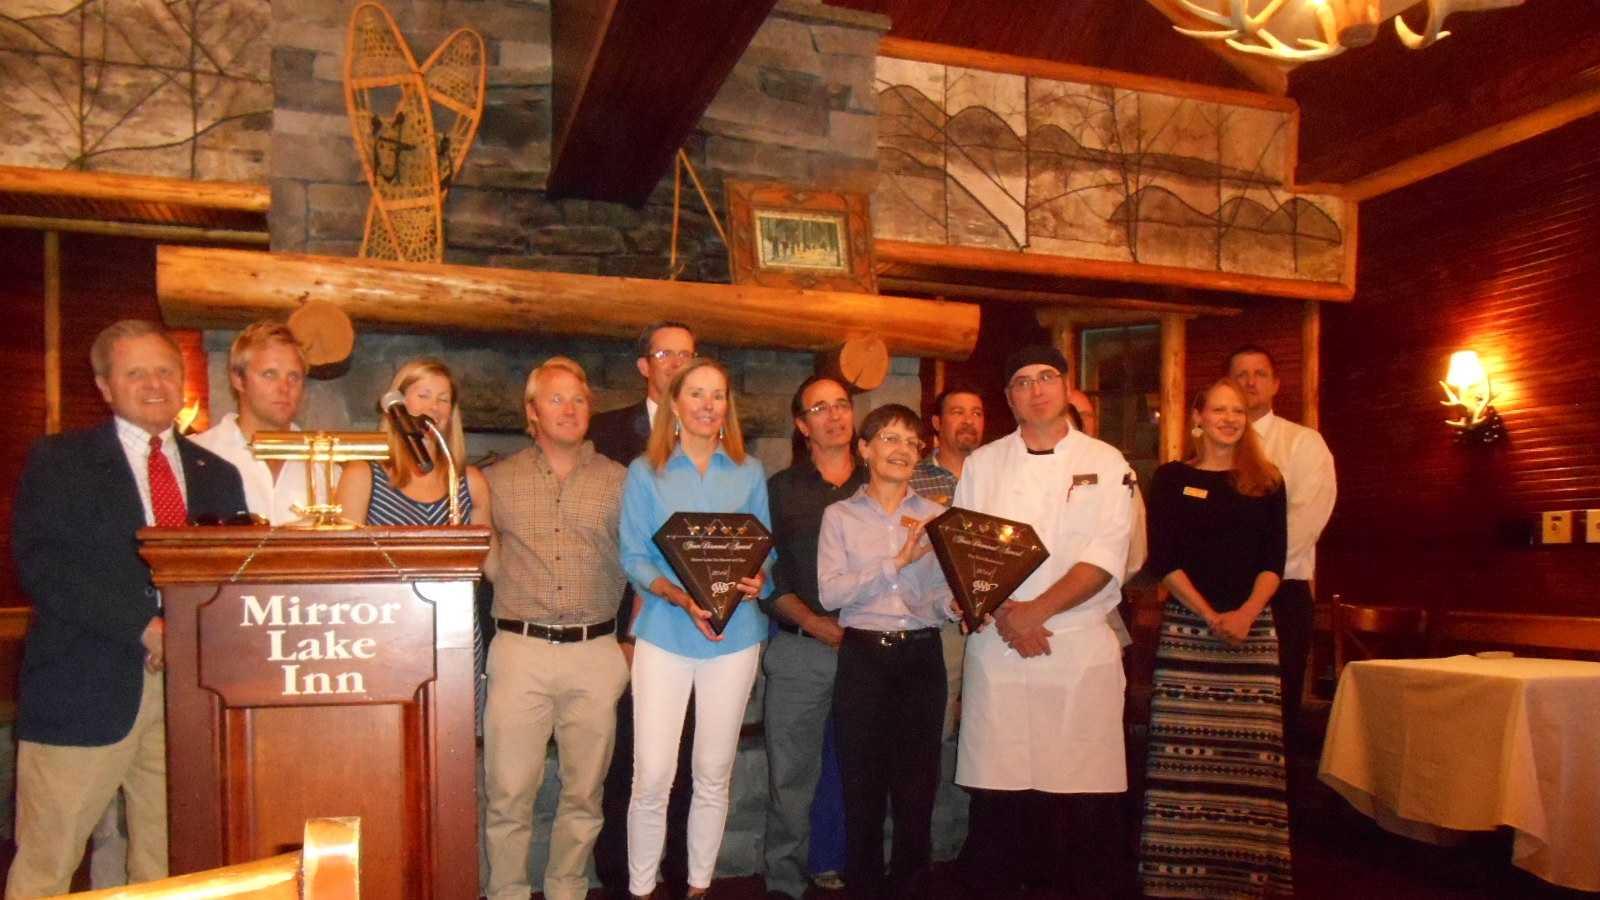 Mirror Lake Inn honored again